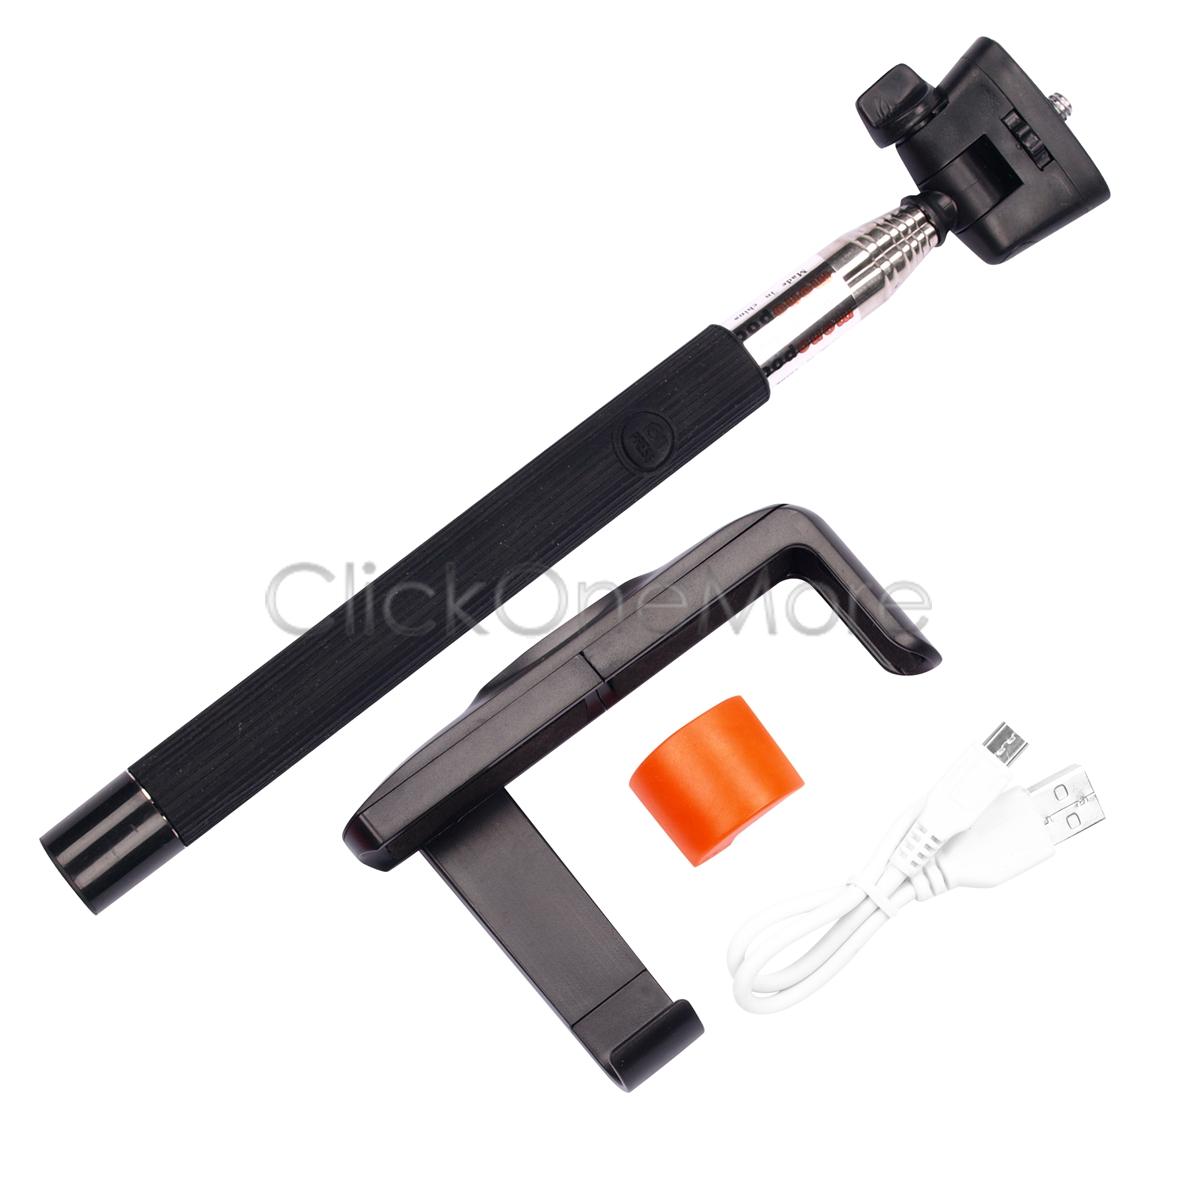 88g monopod selfie stick telescopic wireless remote phone holder for iphone. Black Bedroom Furniture Sets. Home Design Ideas